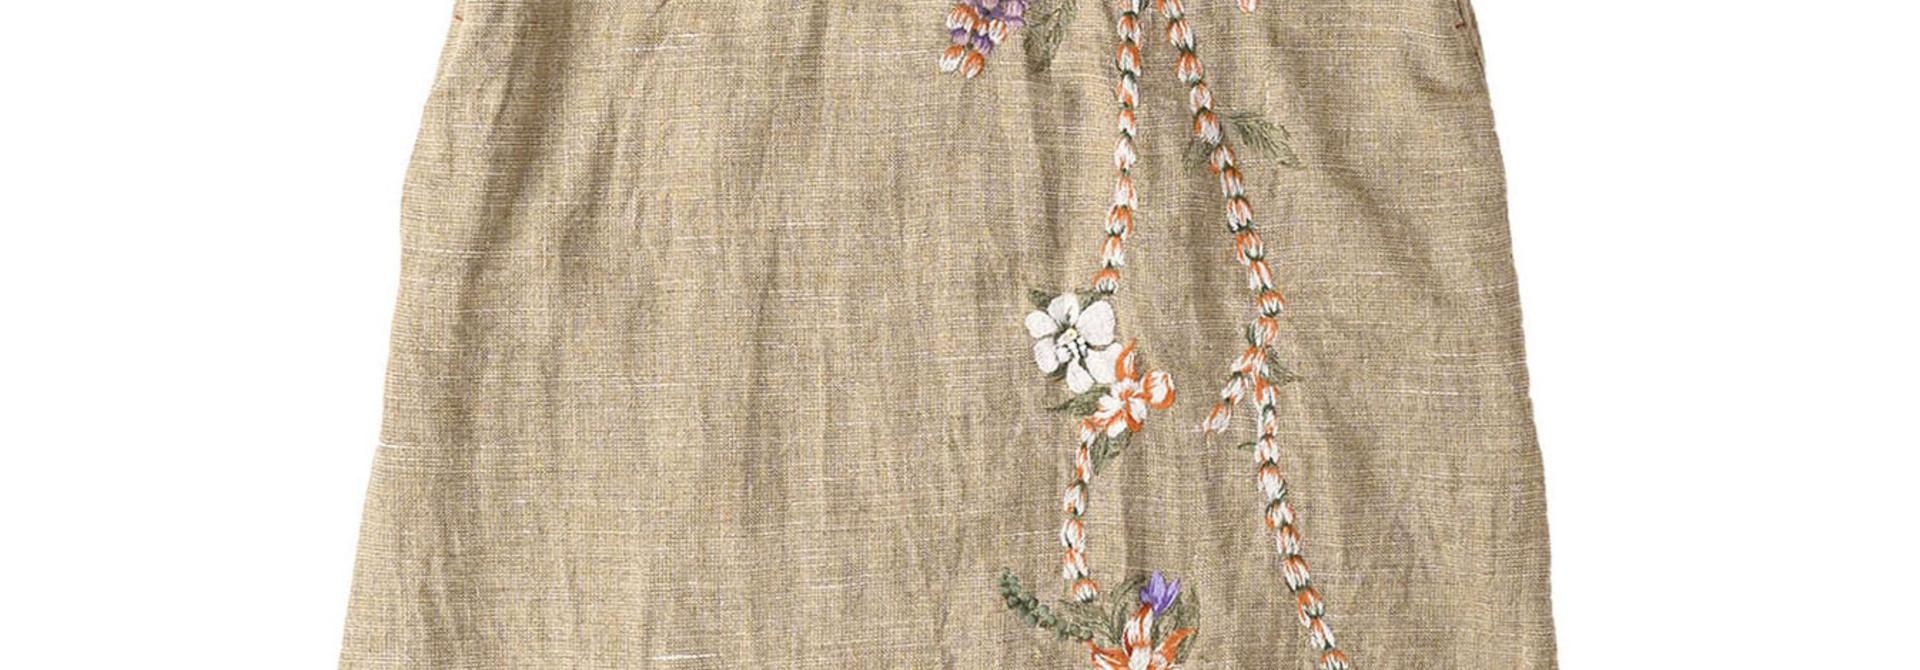 Gima Tweed Leilei Embroidery Dress